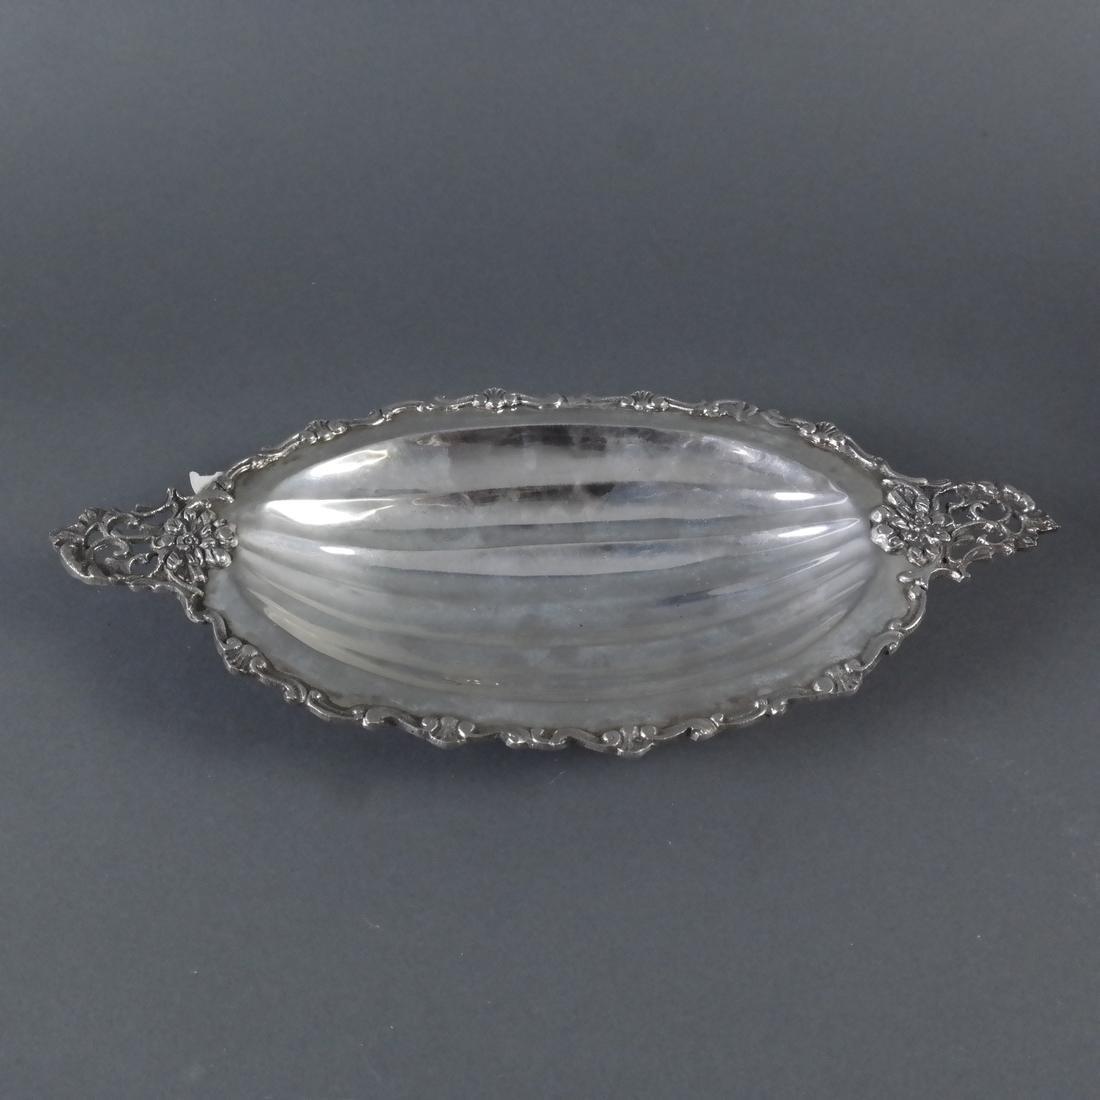 .800 Standard Silver Ornate Fruit Dish - 3